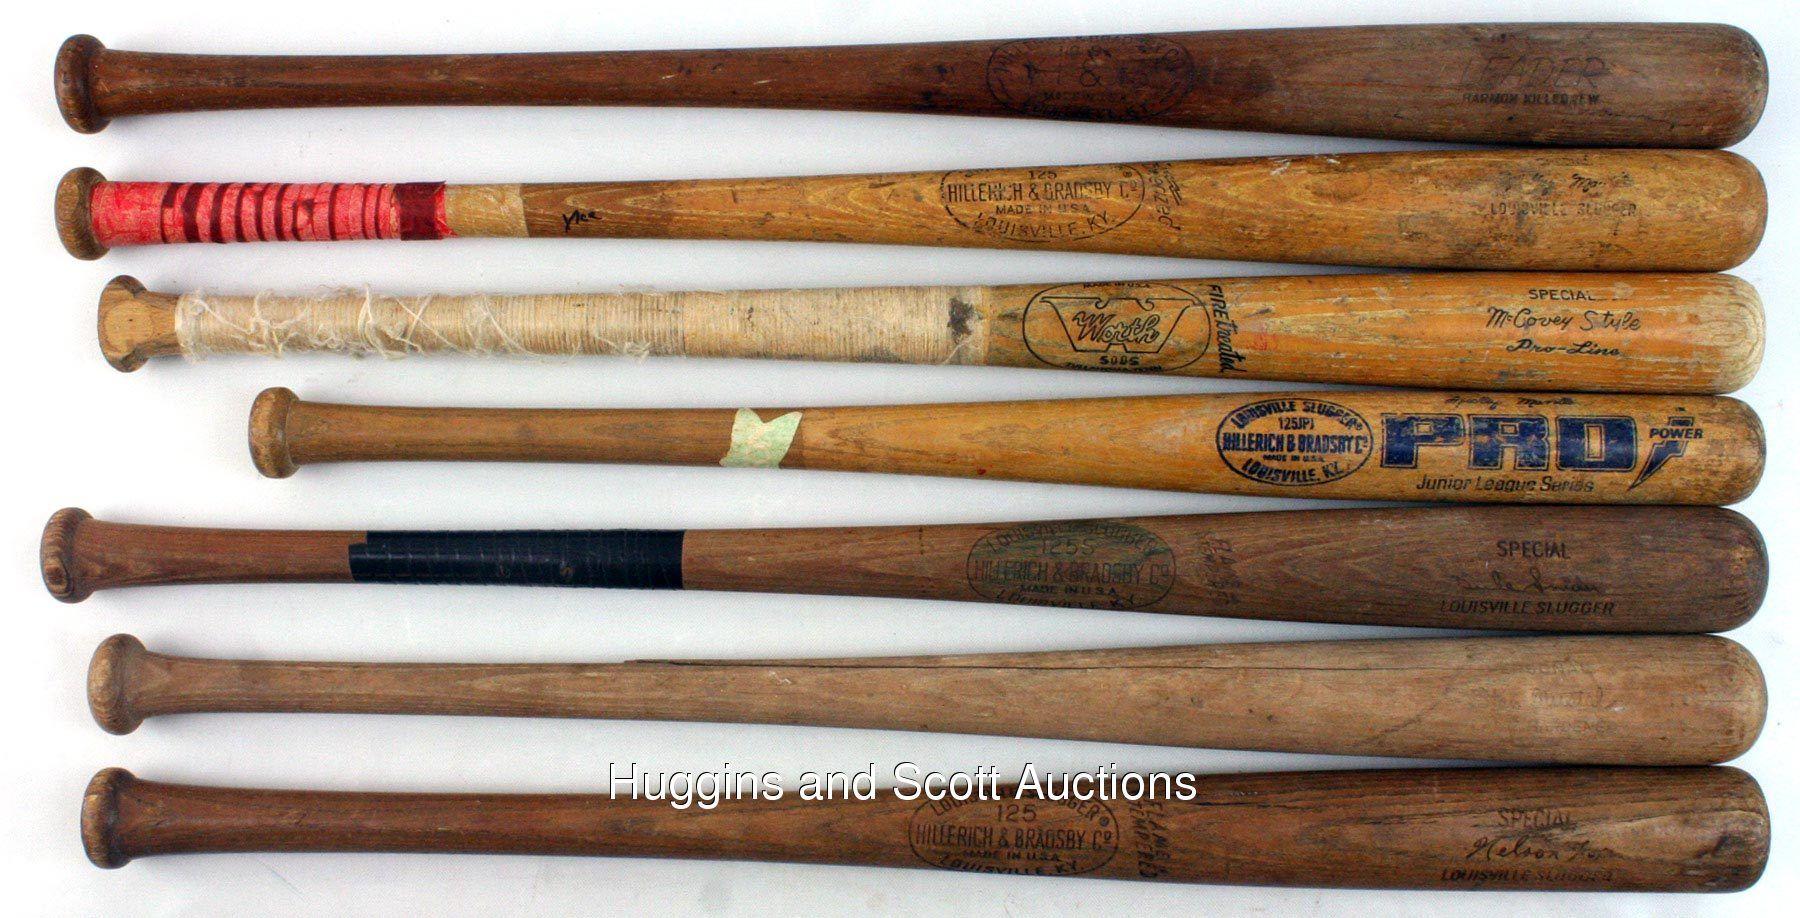 Smithsonian History Of Baseball Bat Image Gallery Old Baseball Bats Baseball History Baseball Bat Baseball